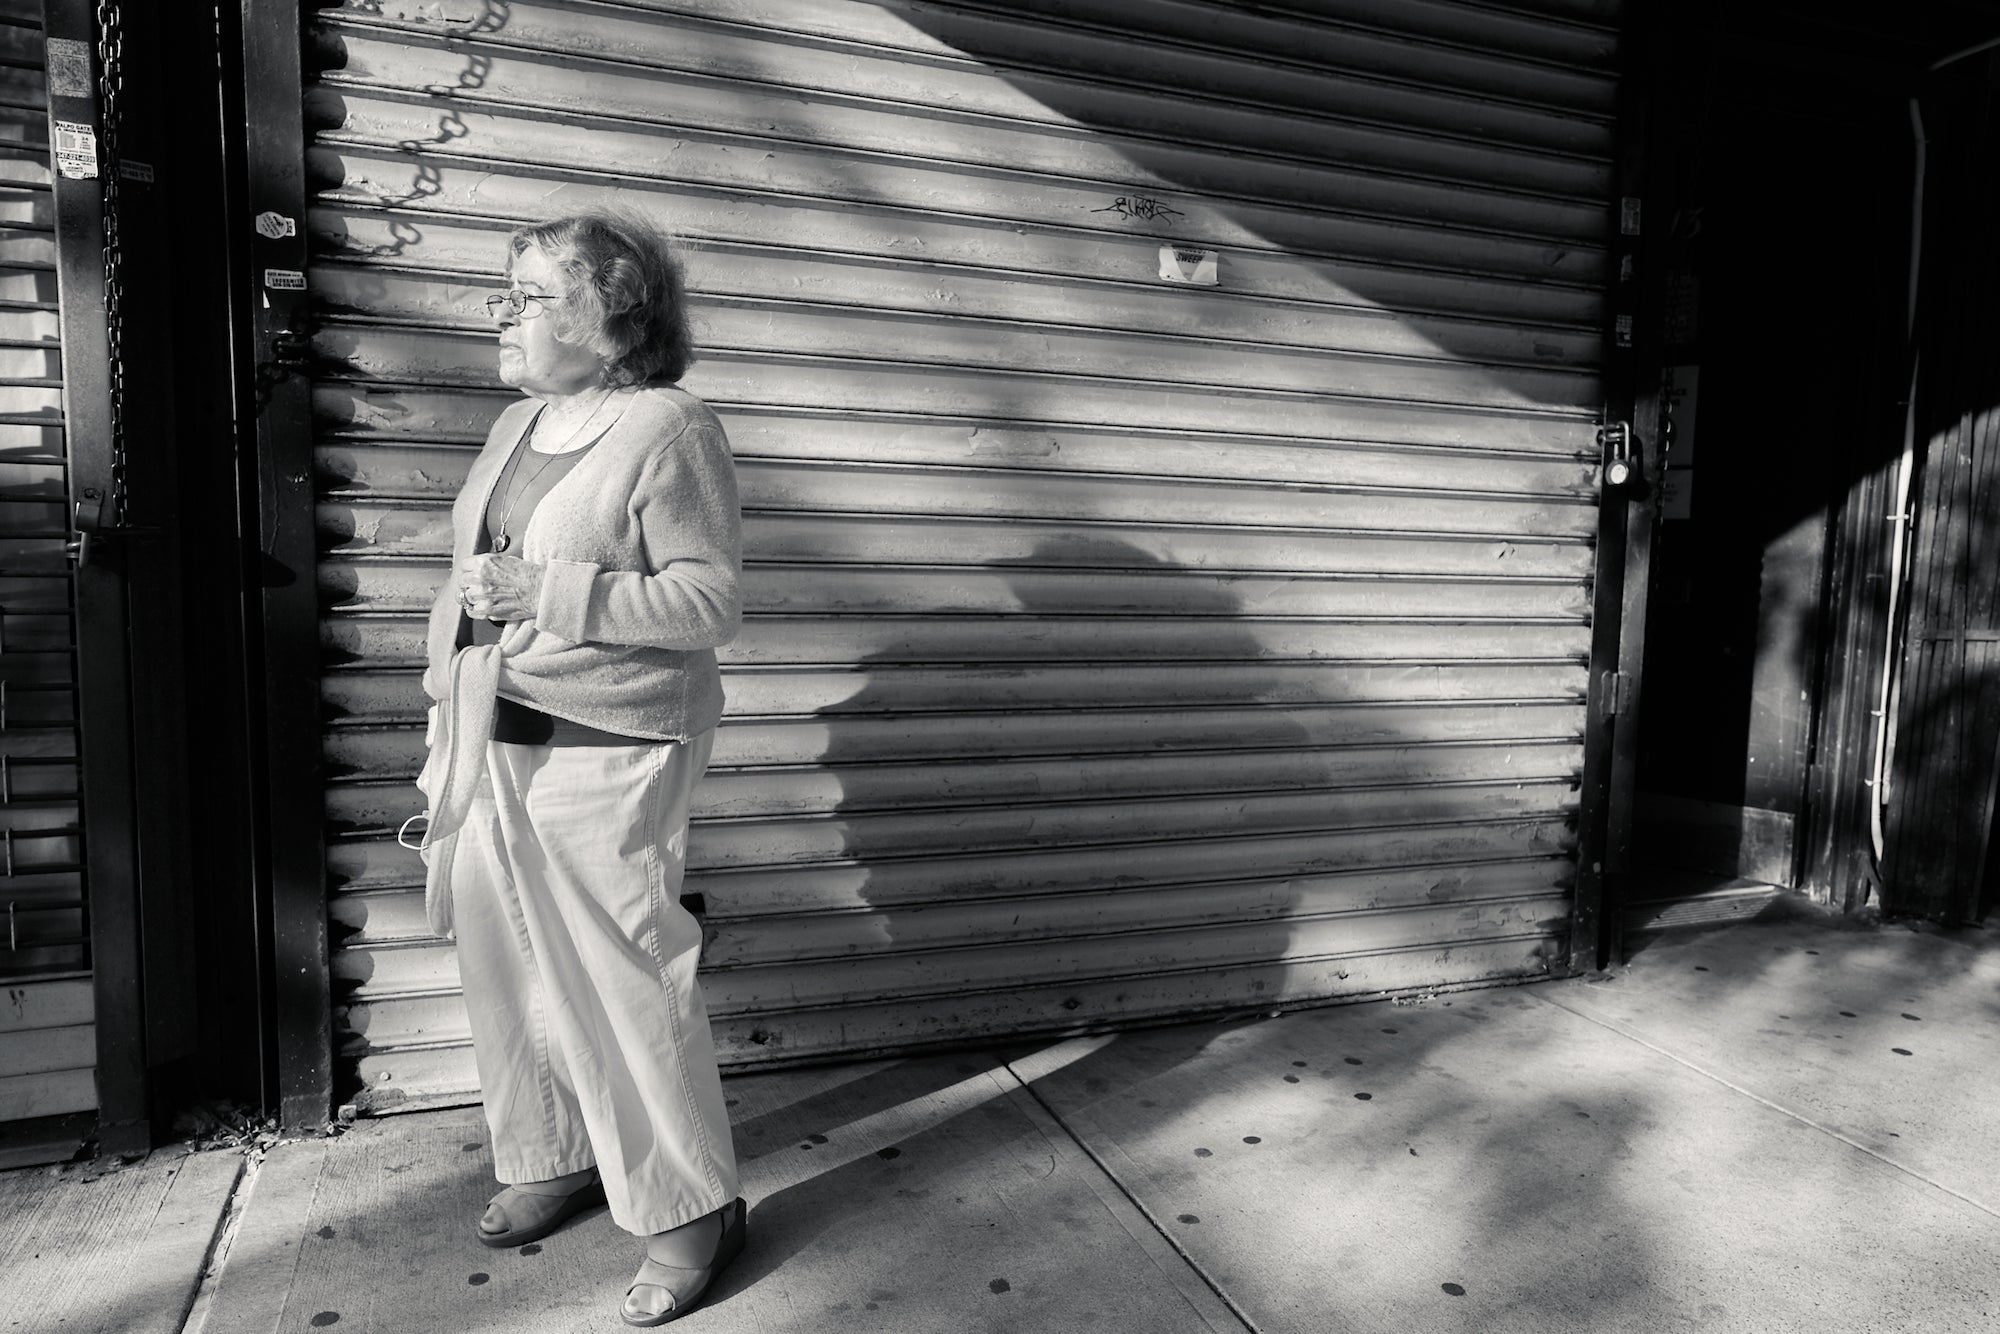 Alpha-Universe-Street-Photography-Tips-Ira-Block-1.jpg